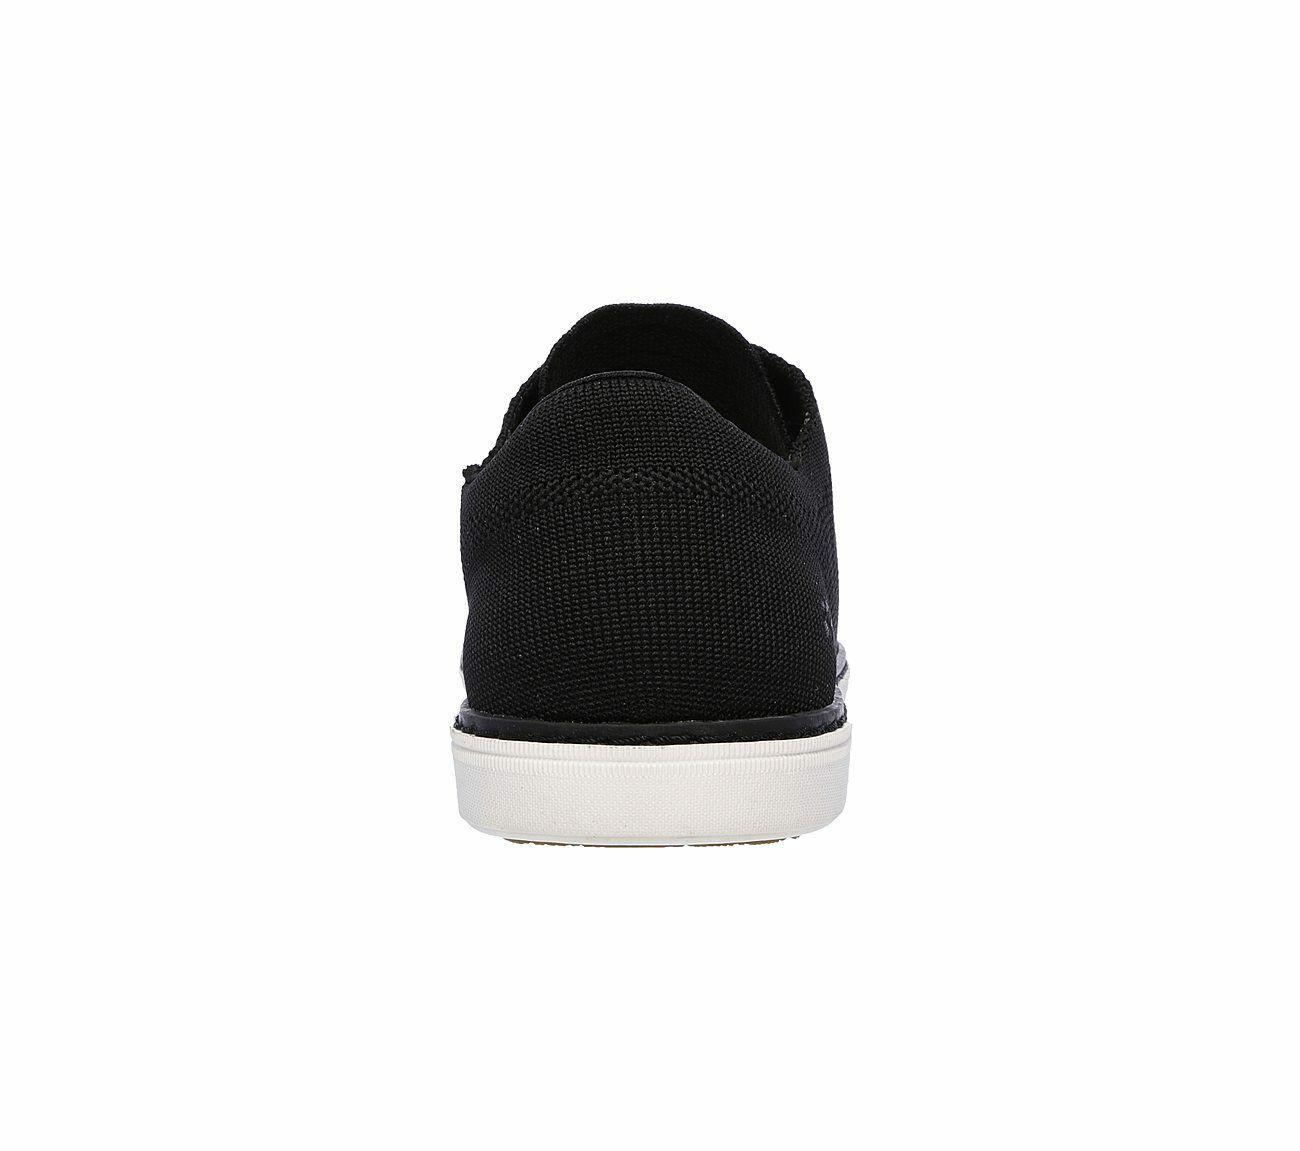 65088, SKECHERS, Lanson Revero, USA Men's Lace Up, Classic Fit, Casual Shoes image 4